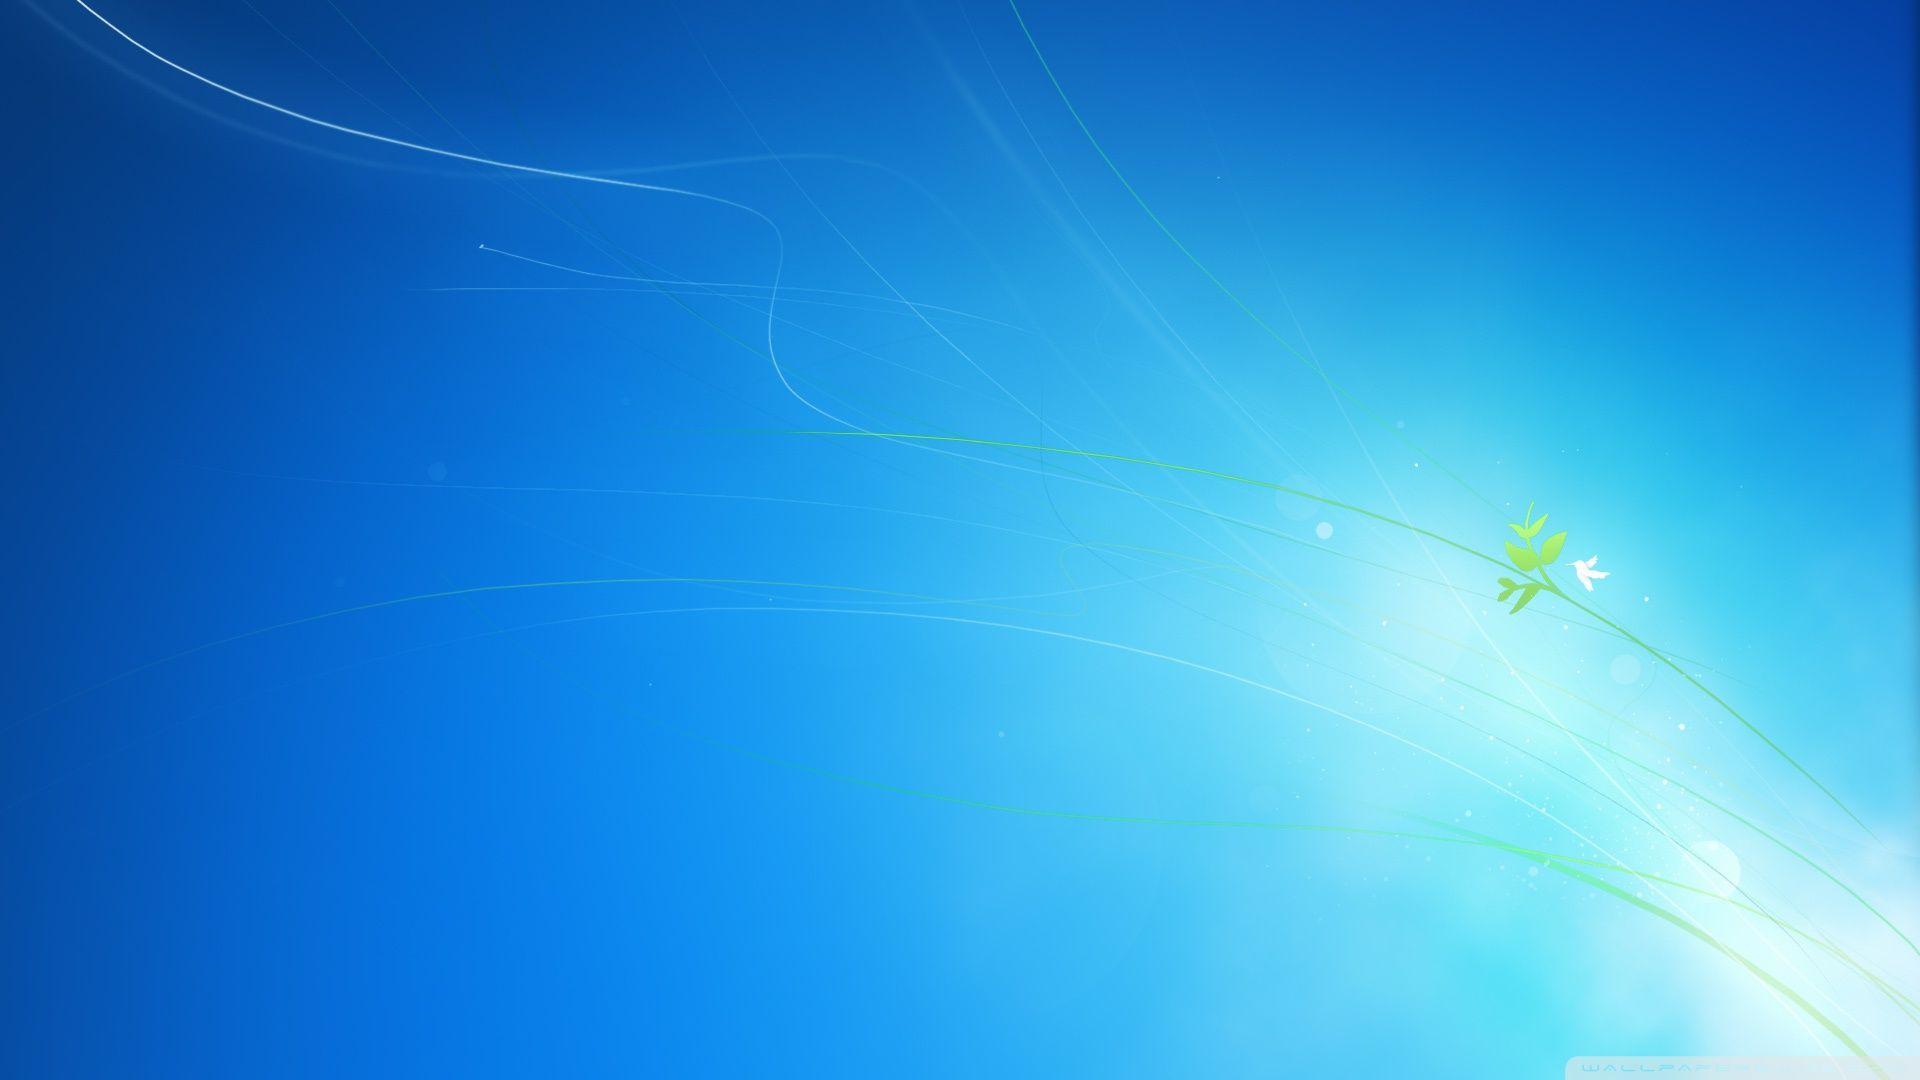 Backgrounds Windows 7 - Wallpaper Cave